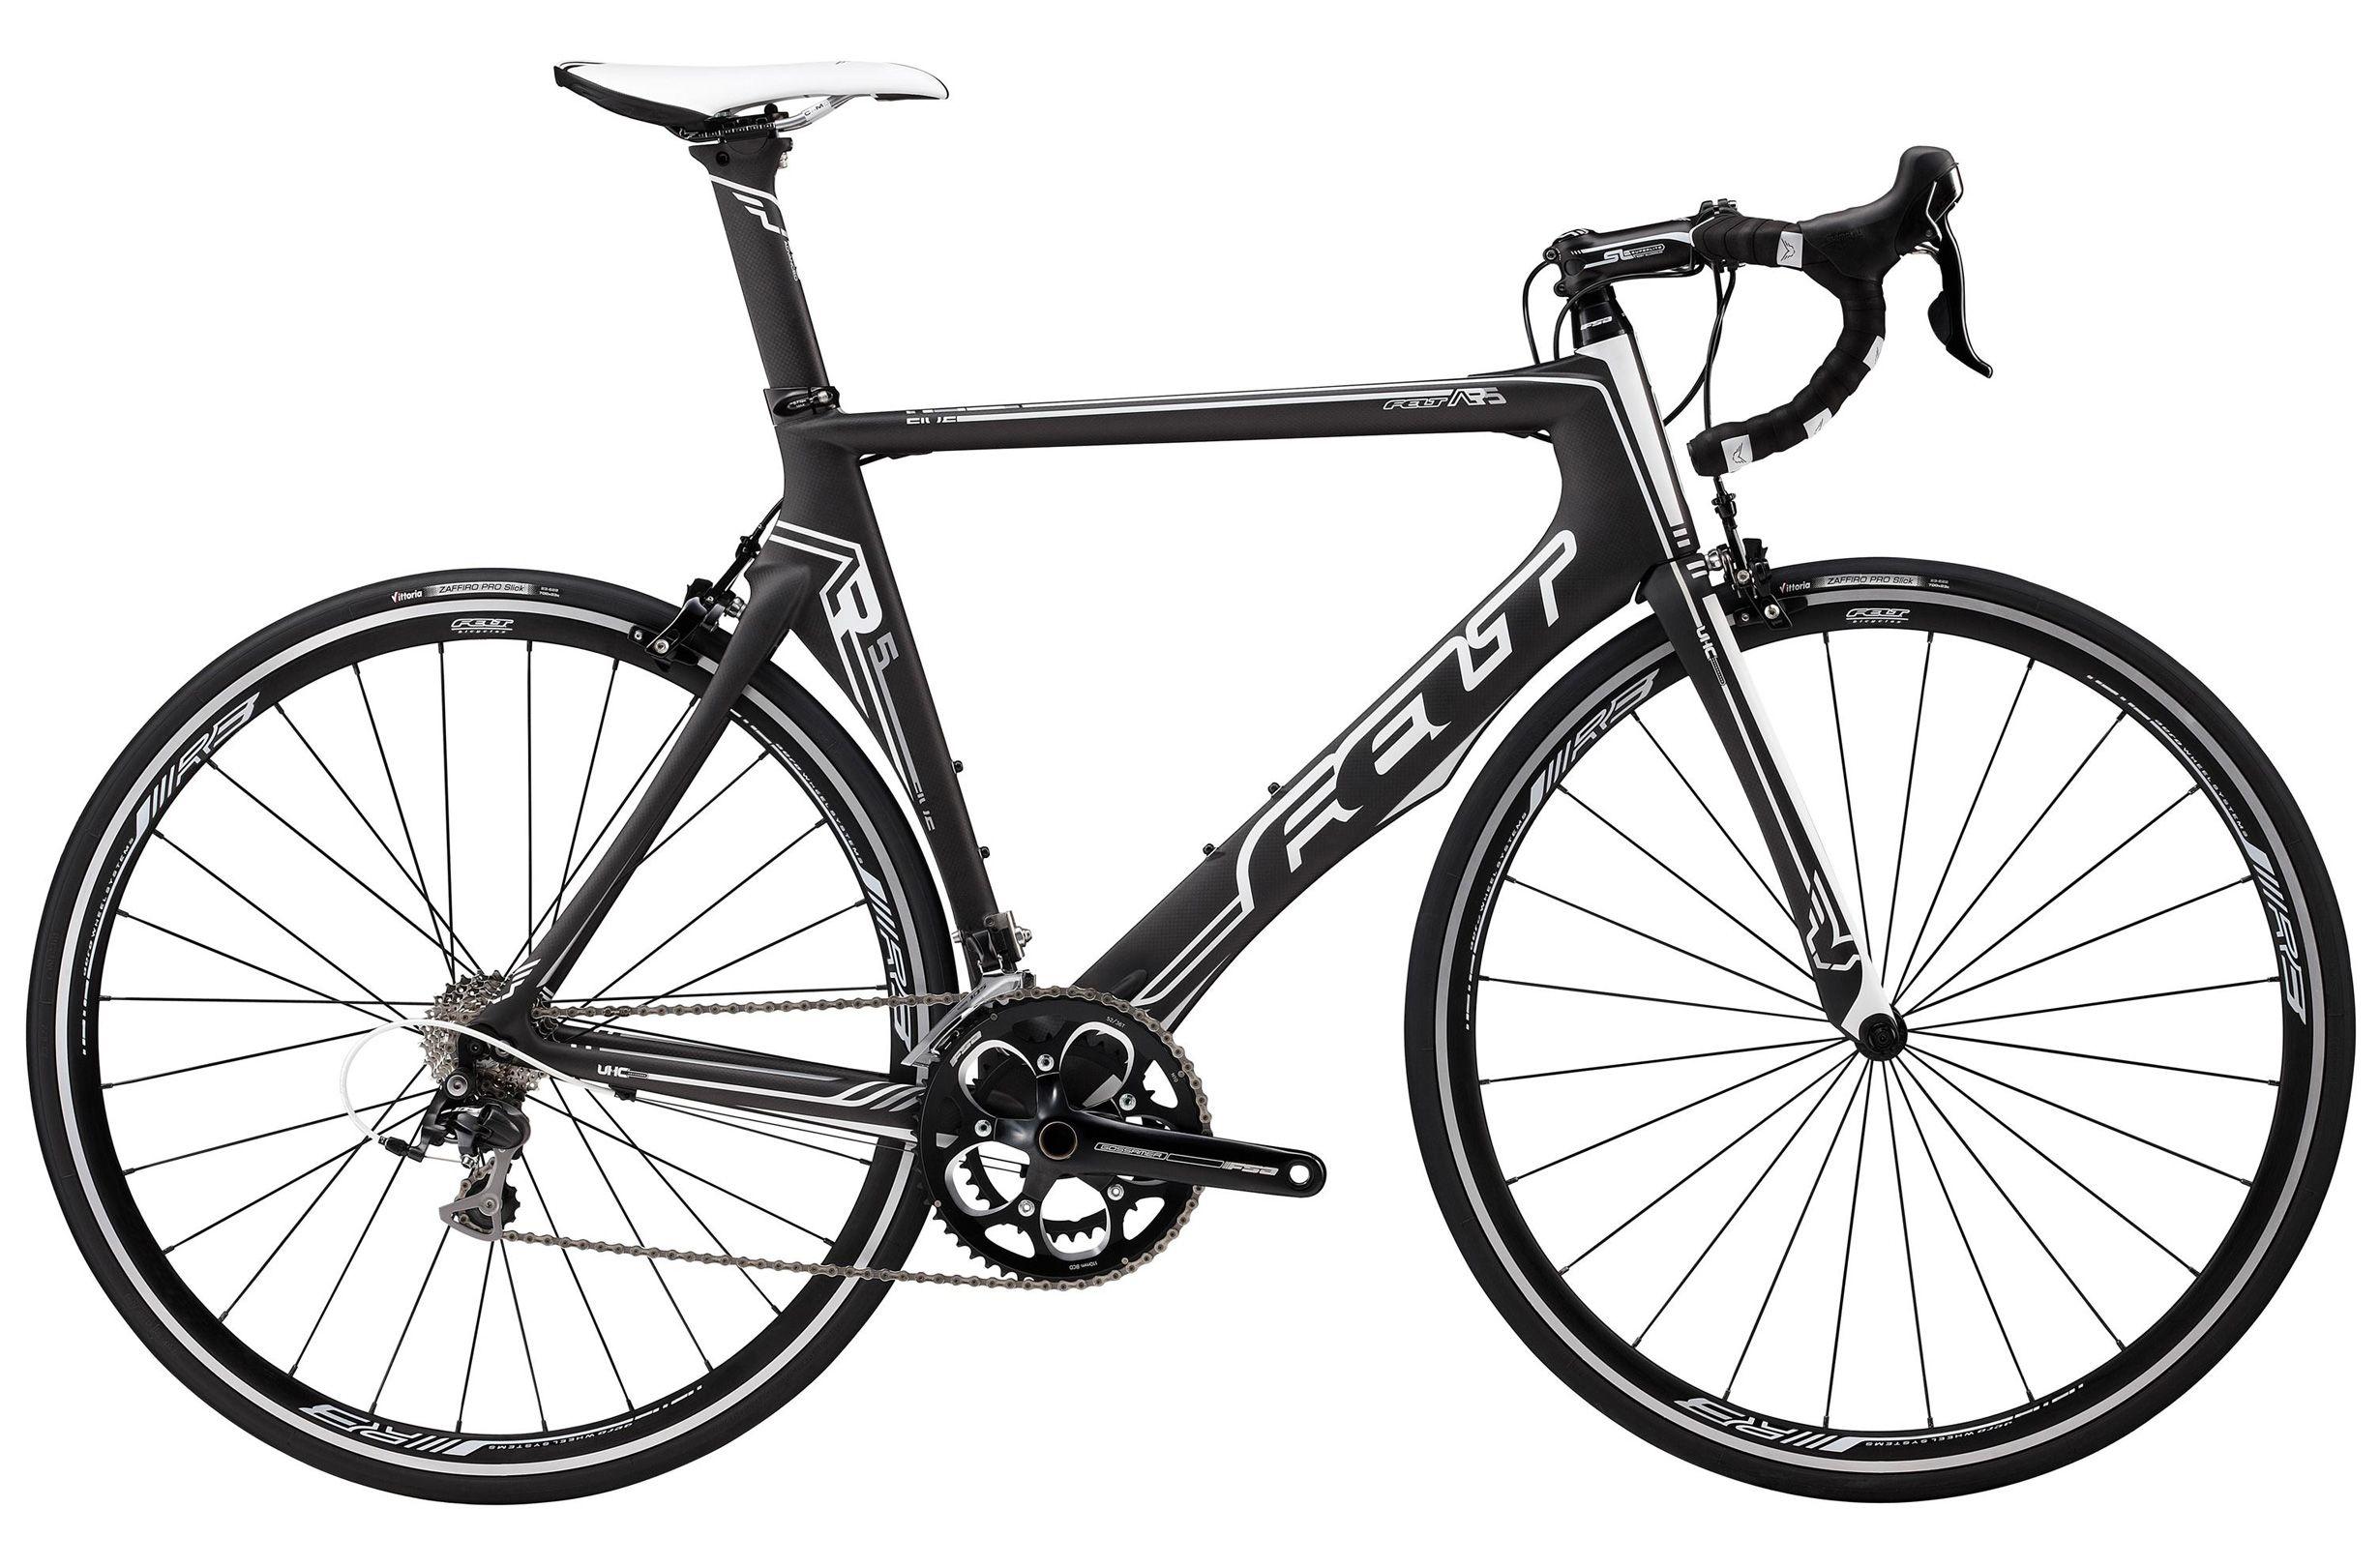 Http Www Evanscycles Com Product Image Image 589 B81 31c 66888 Felt Ar5 2012 Road Bike Jpg Felt Bicycles Road Bike Cycling Bicycle